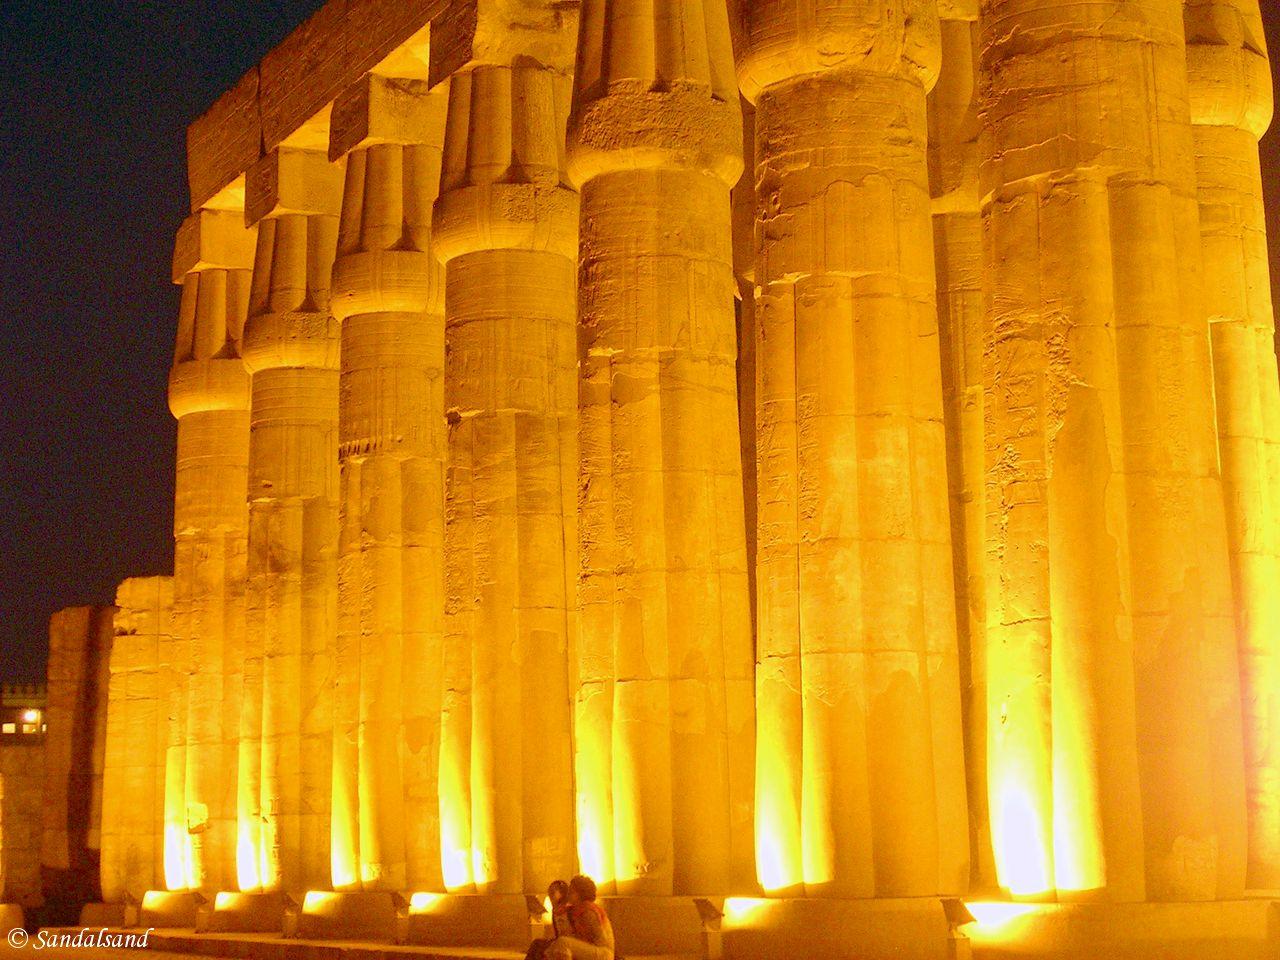 VIDEO – Egypt – The Nile (7) Luxor Temple